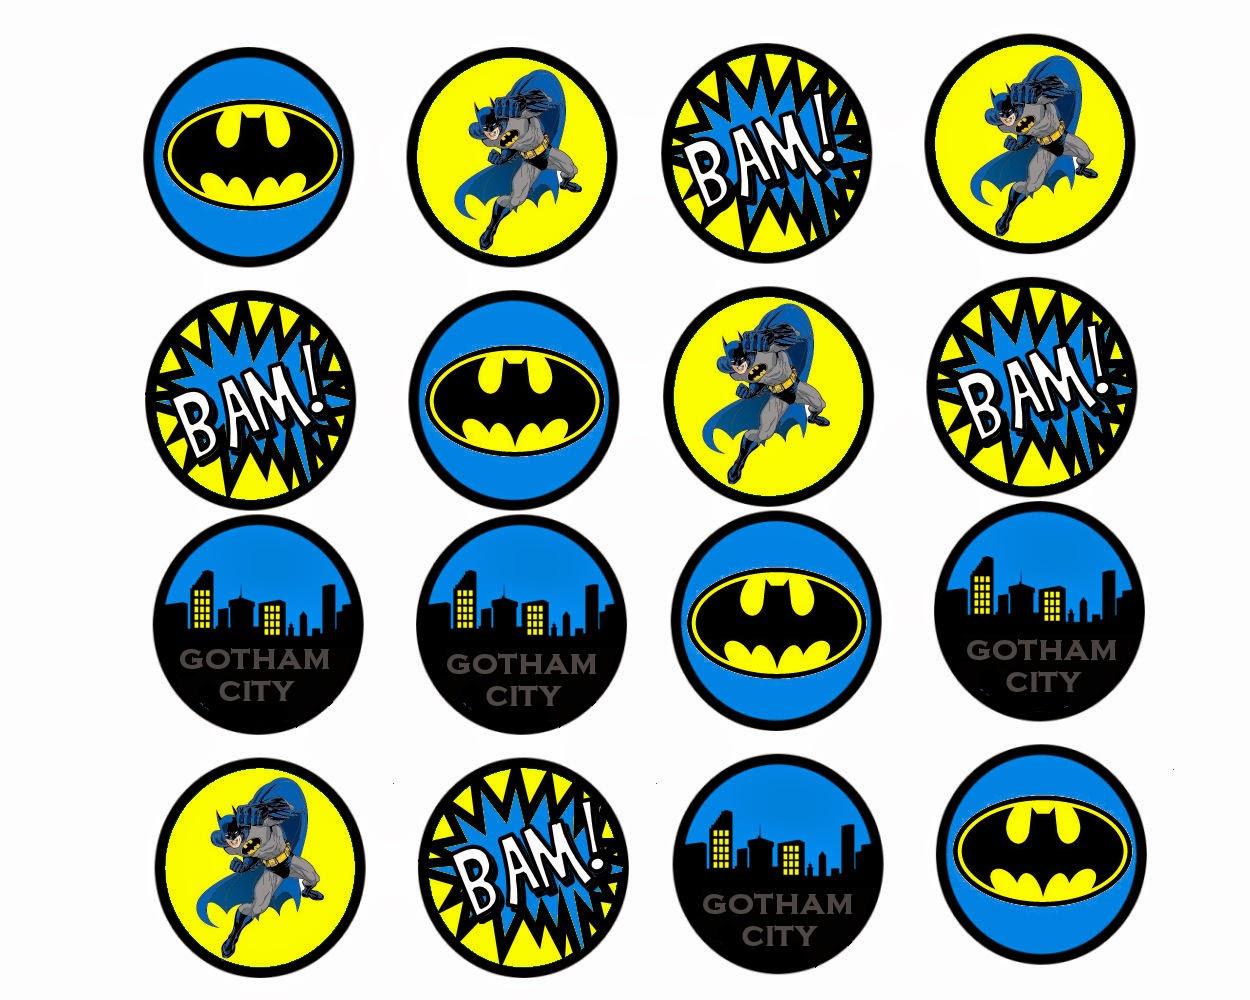 Batman Free Printable Mini Kit Oh My Fiesta In English